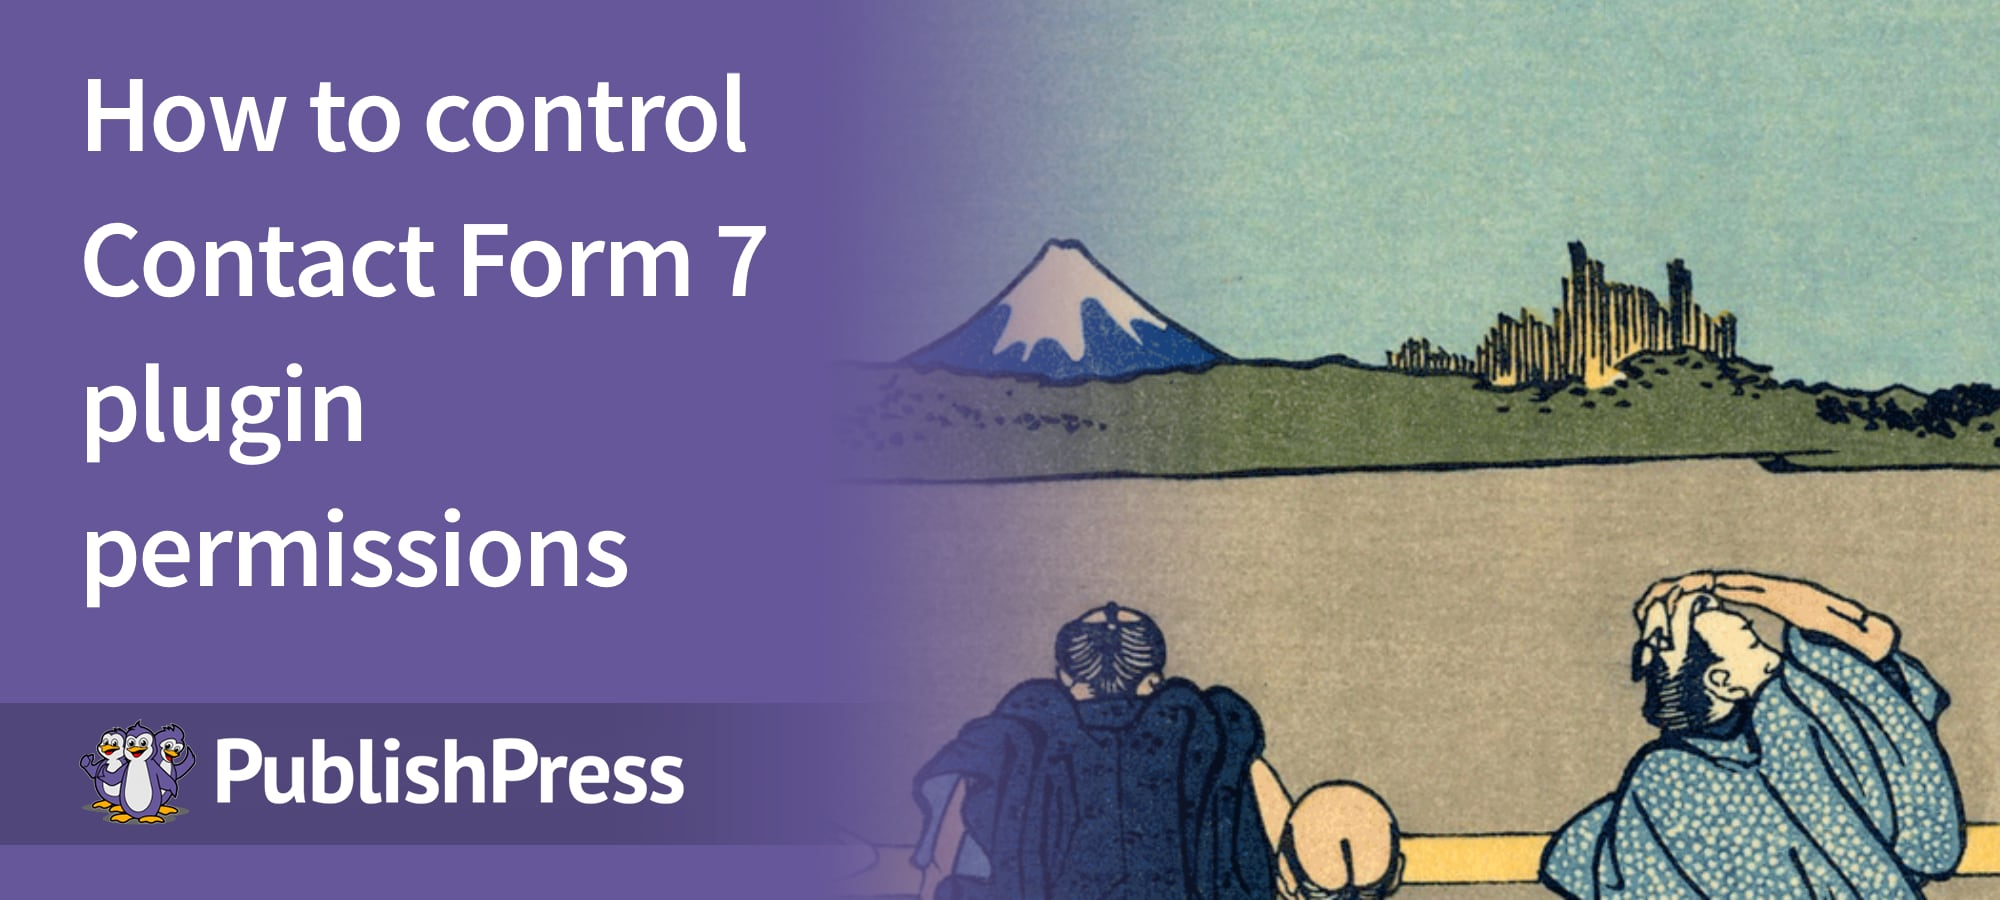 Contact Form 7 Header